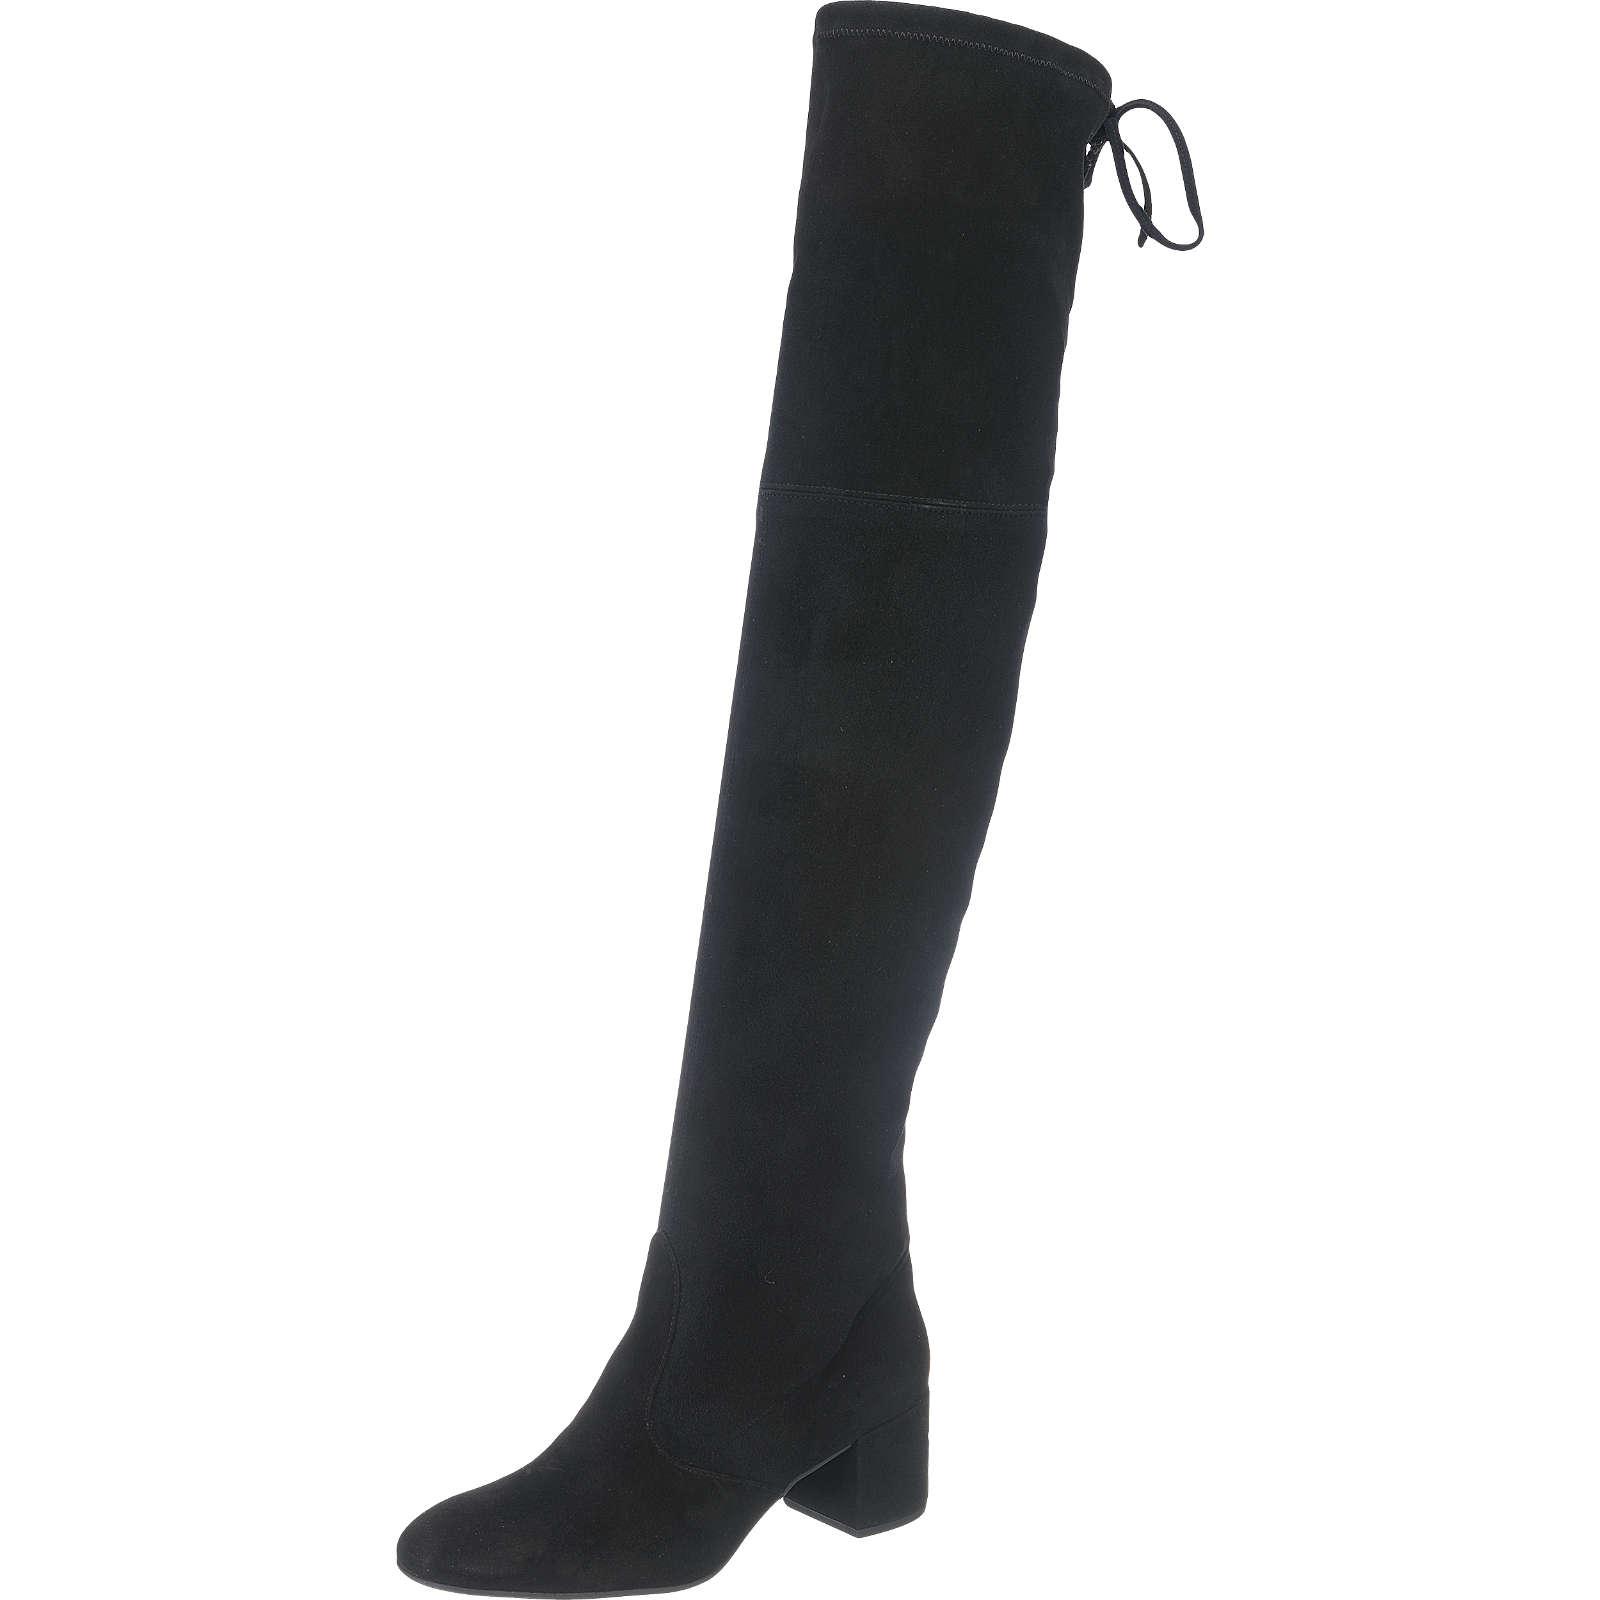 högl Stiefel schwarz Damen Gr. 37,5